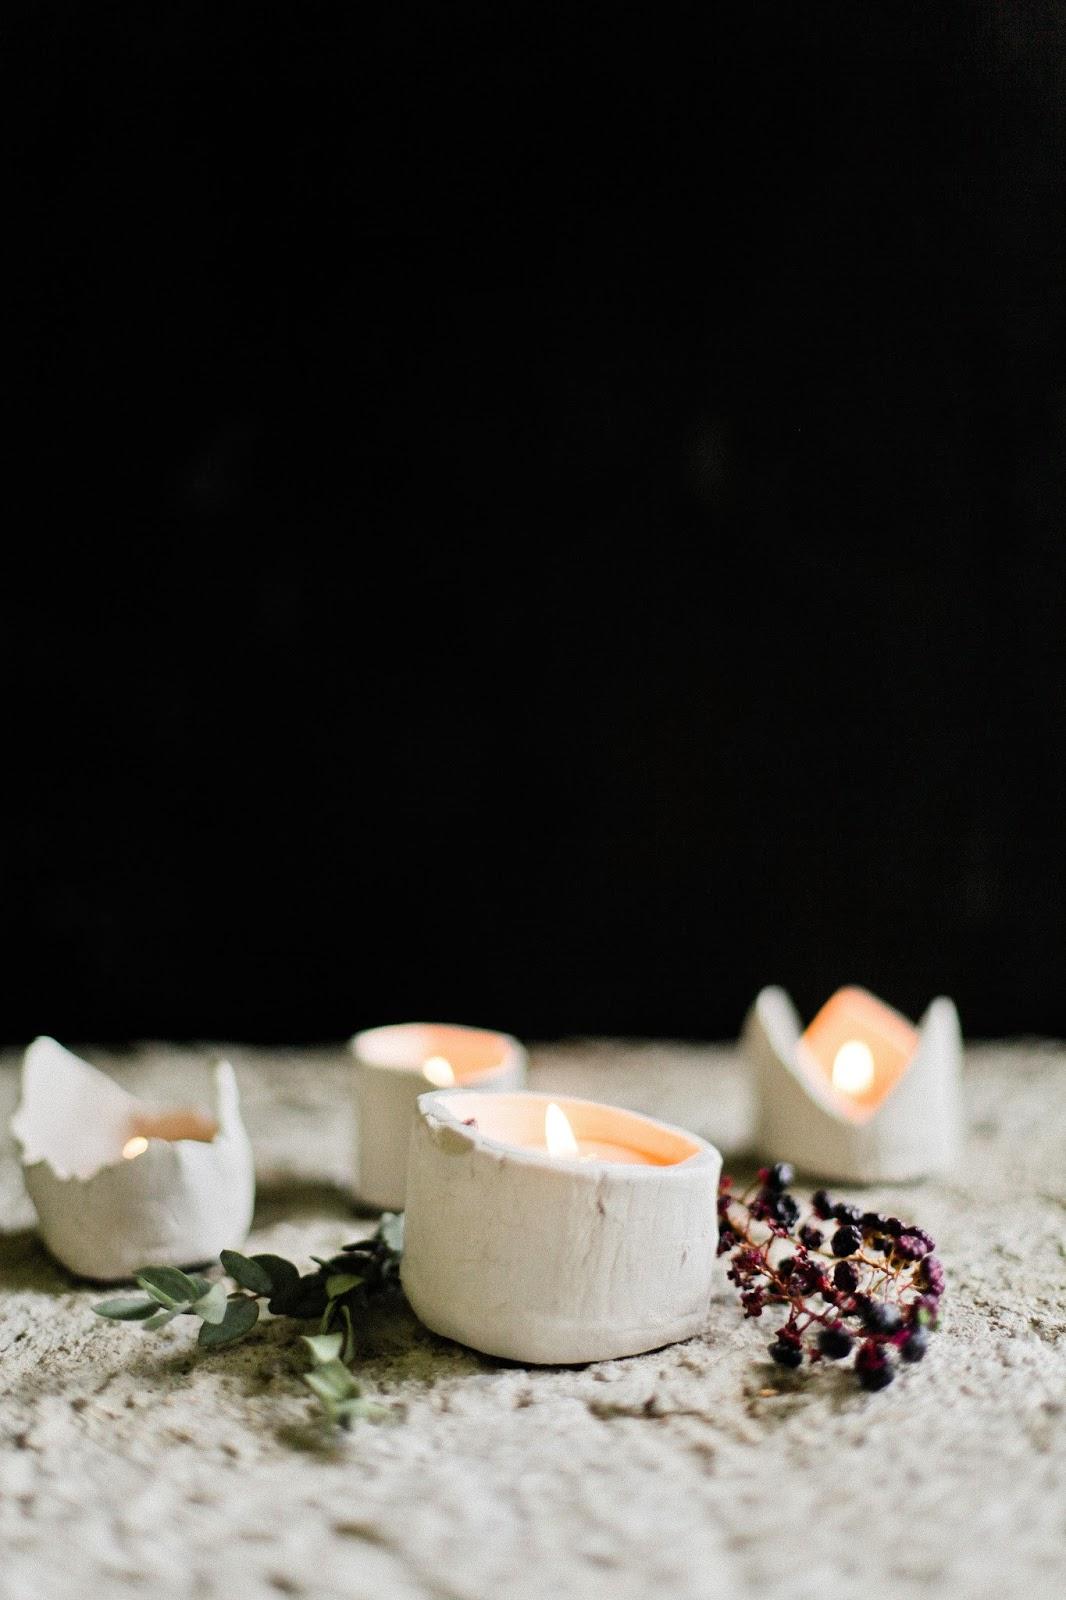 candle votive sdiy sincerely kinsey blog